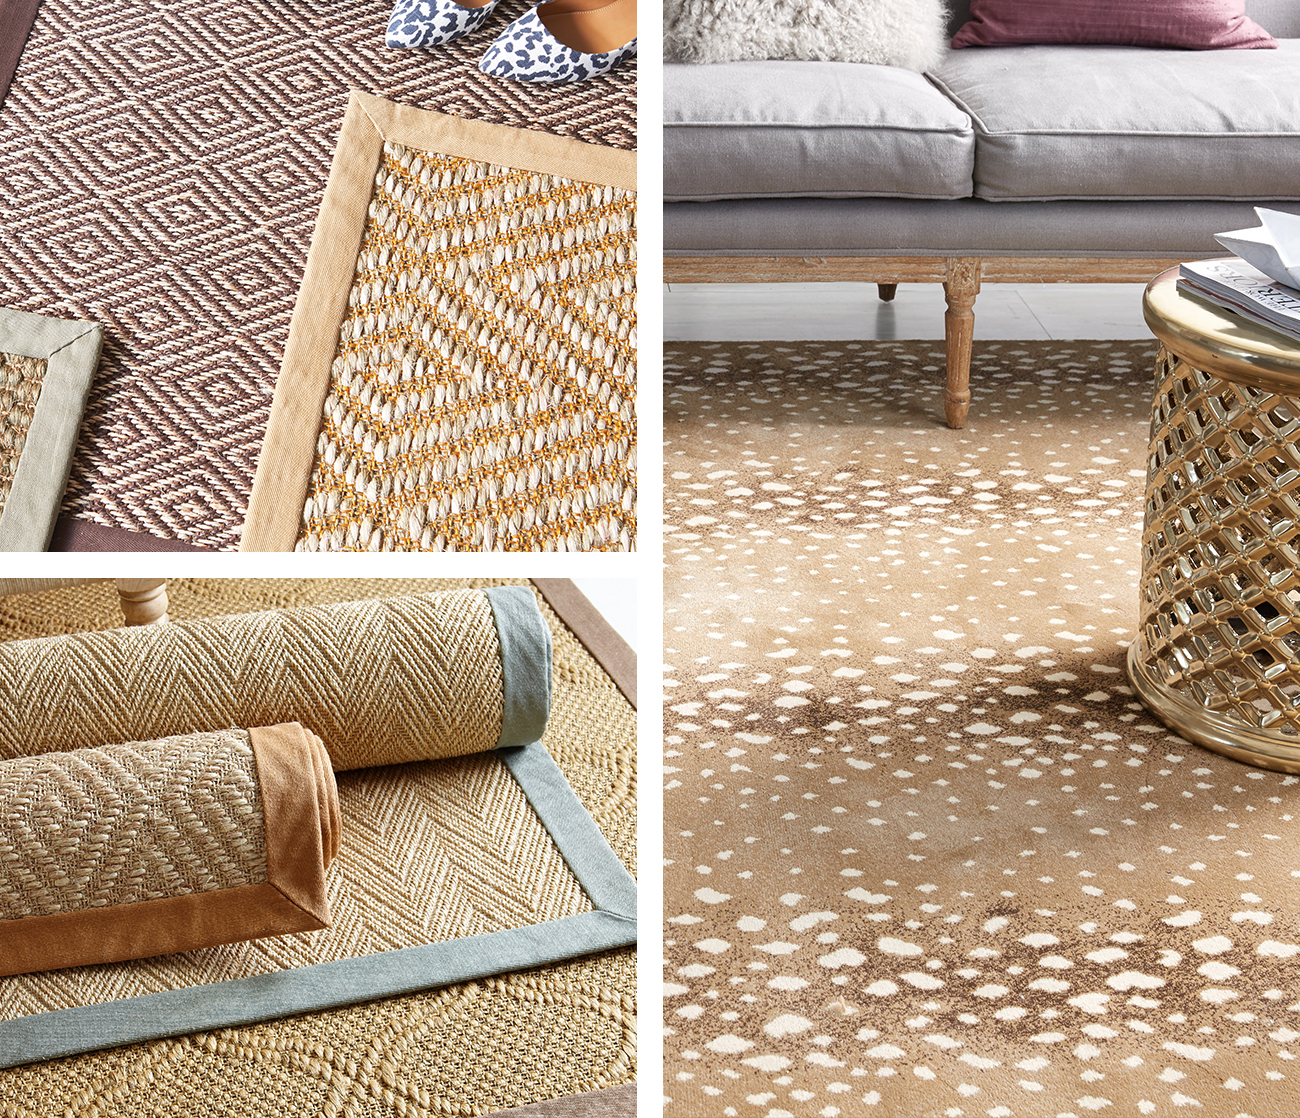 l carpet chad animal rugs carpets stark rug print hermeymonica